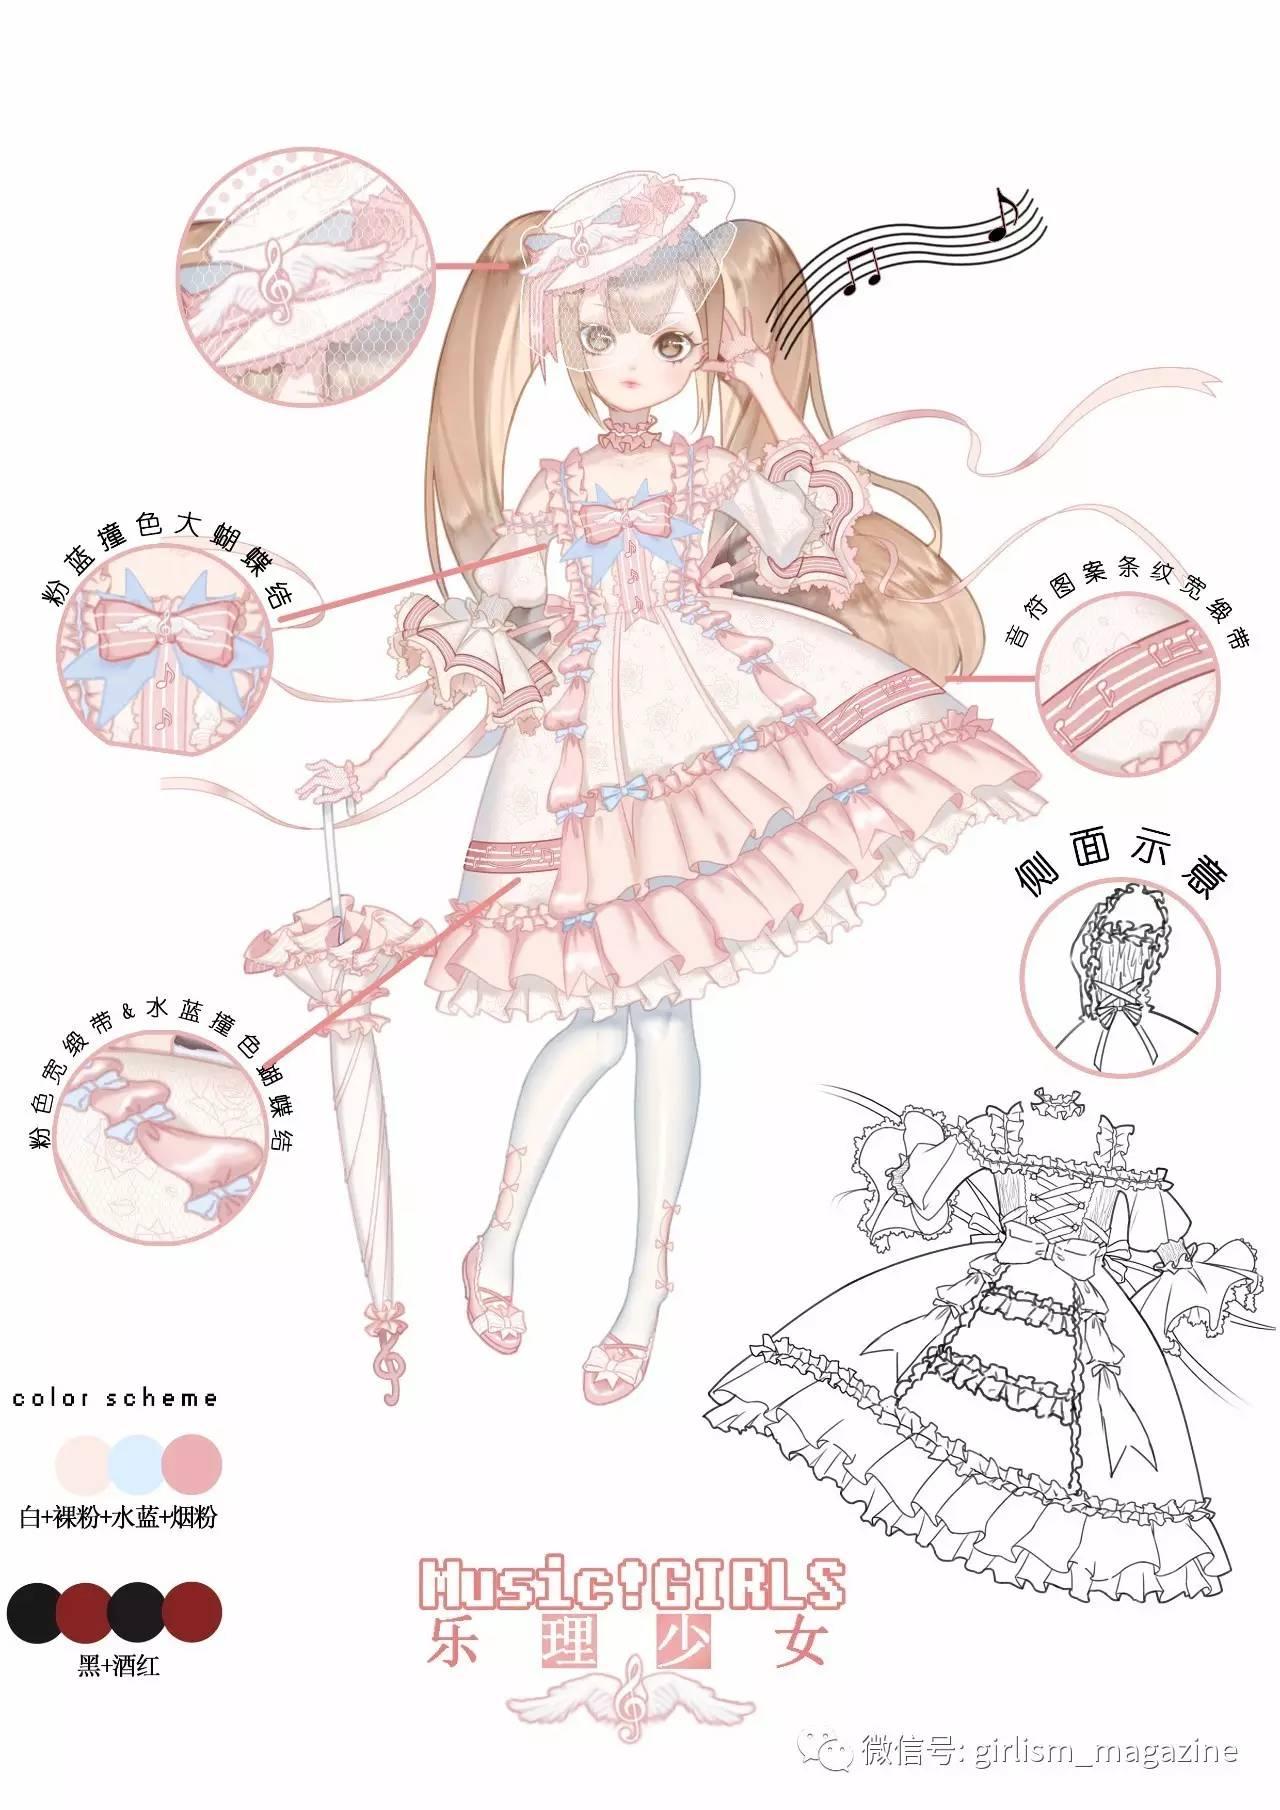 【lolita画稿大赛】参赛作品展示11,发现遗珠之美图片